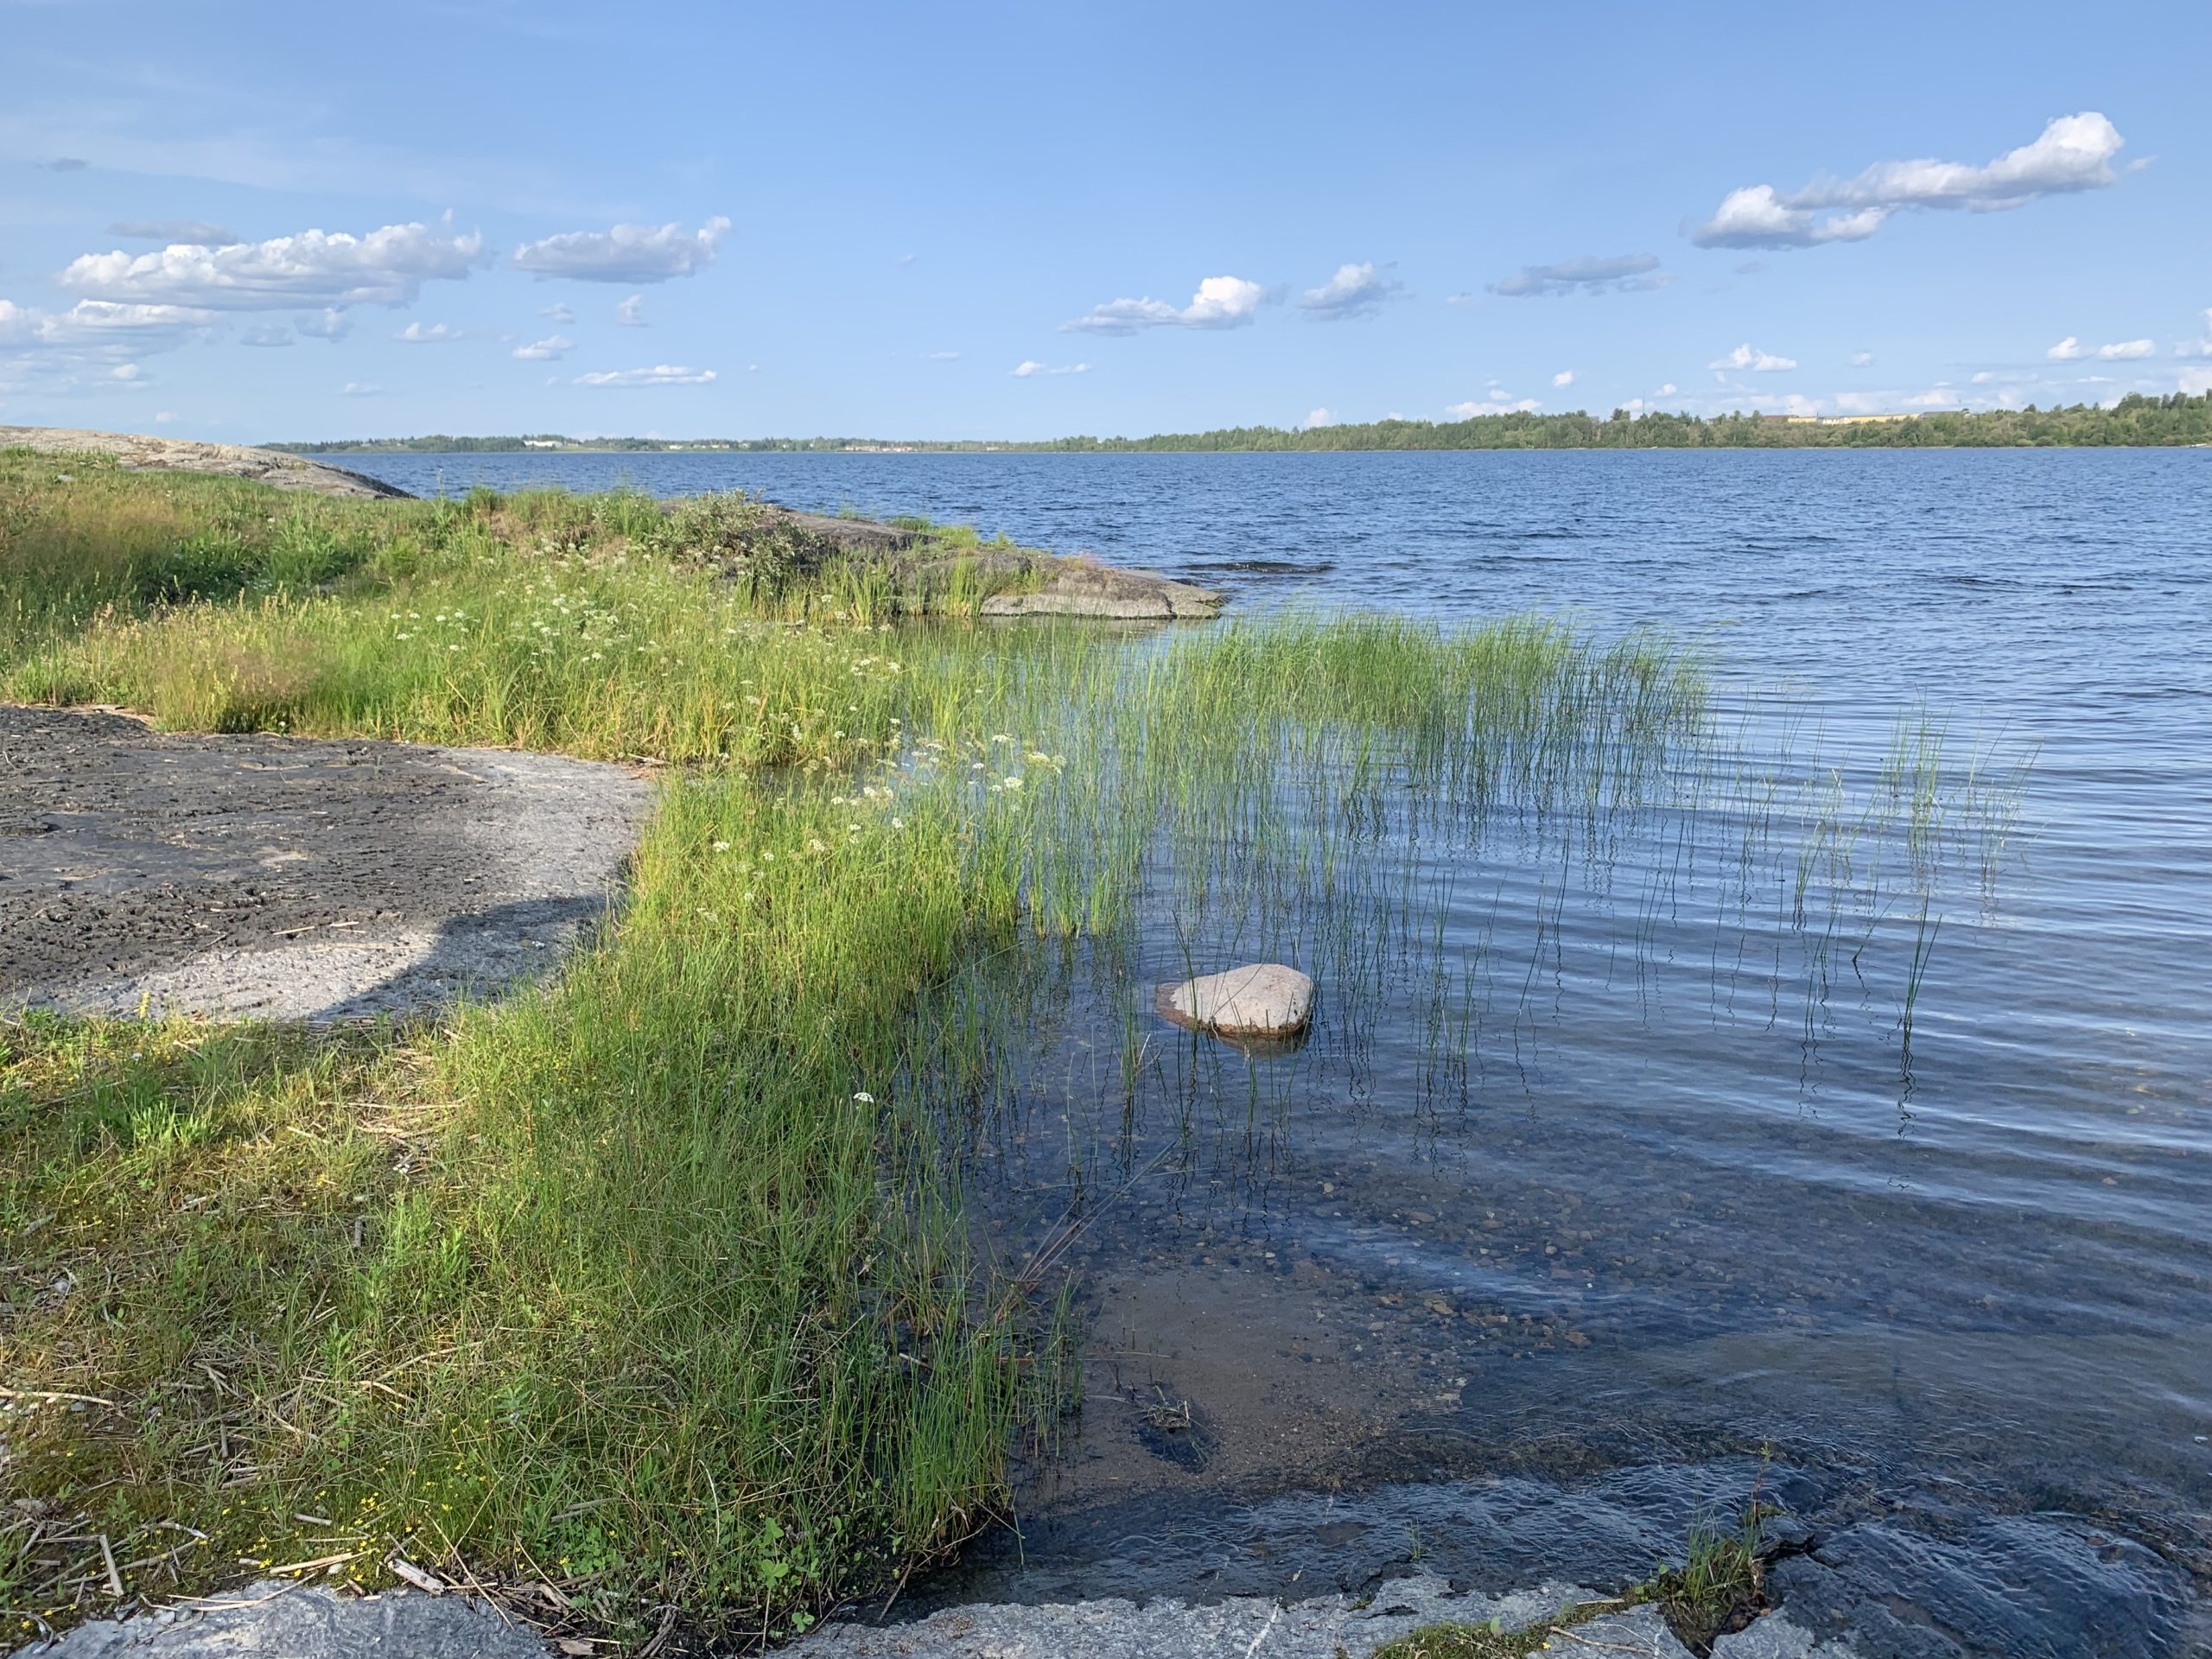 Waterfront view in Bunibonibee Cree Nation